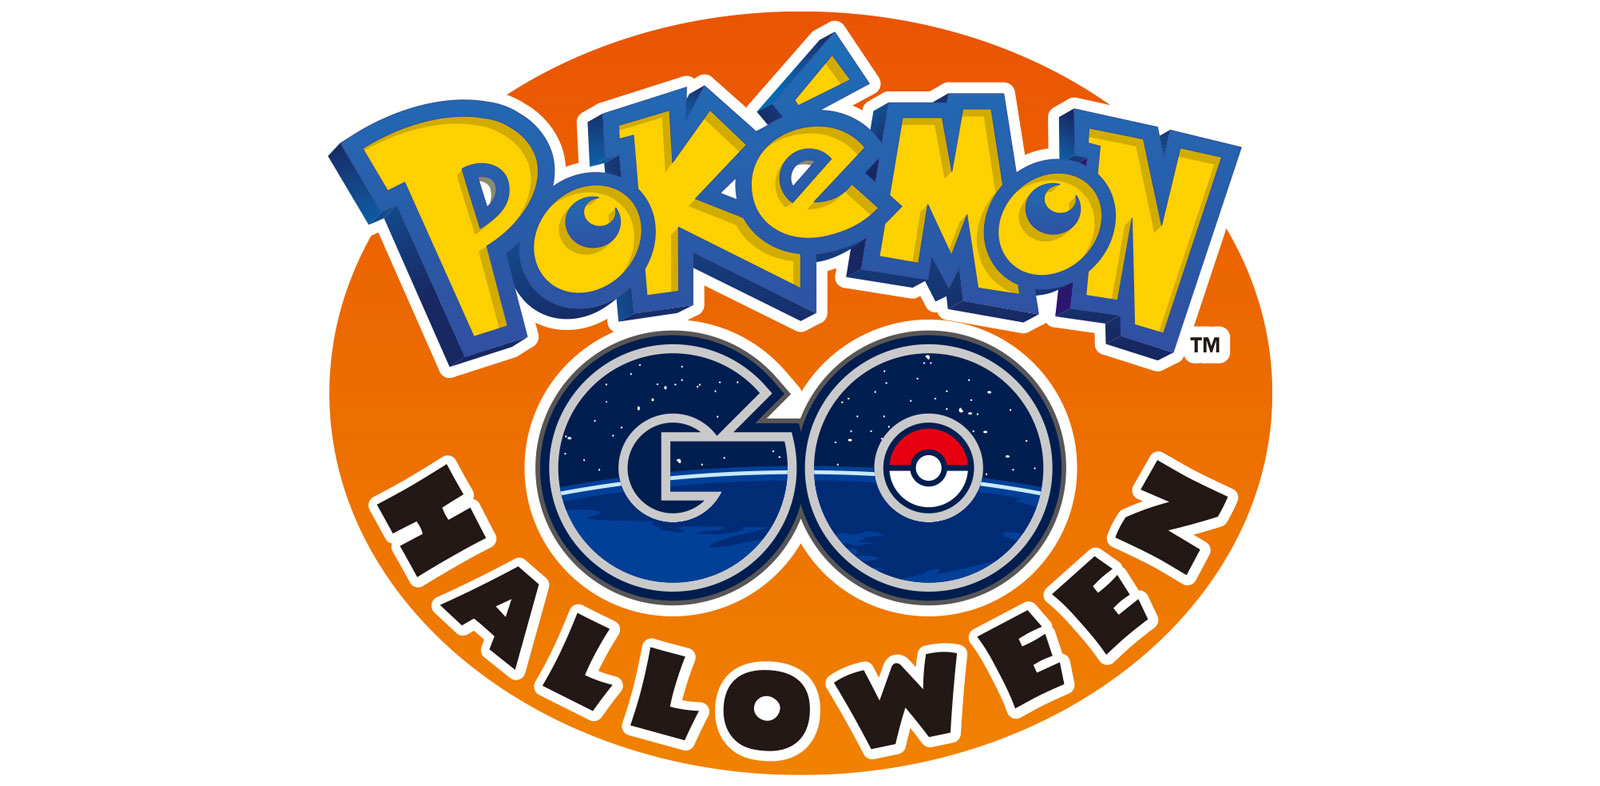 pokémon go offering spooky bonuses for halloween